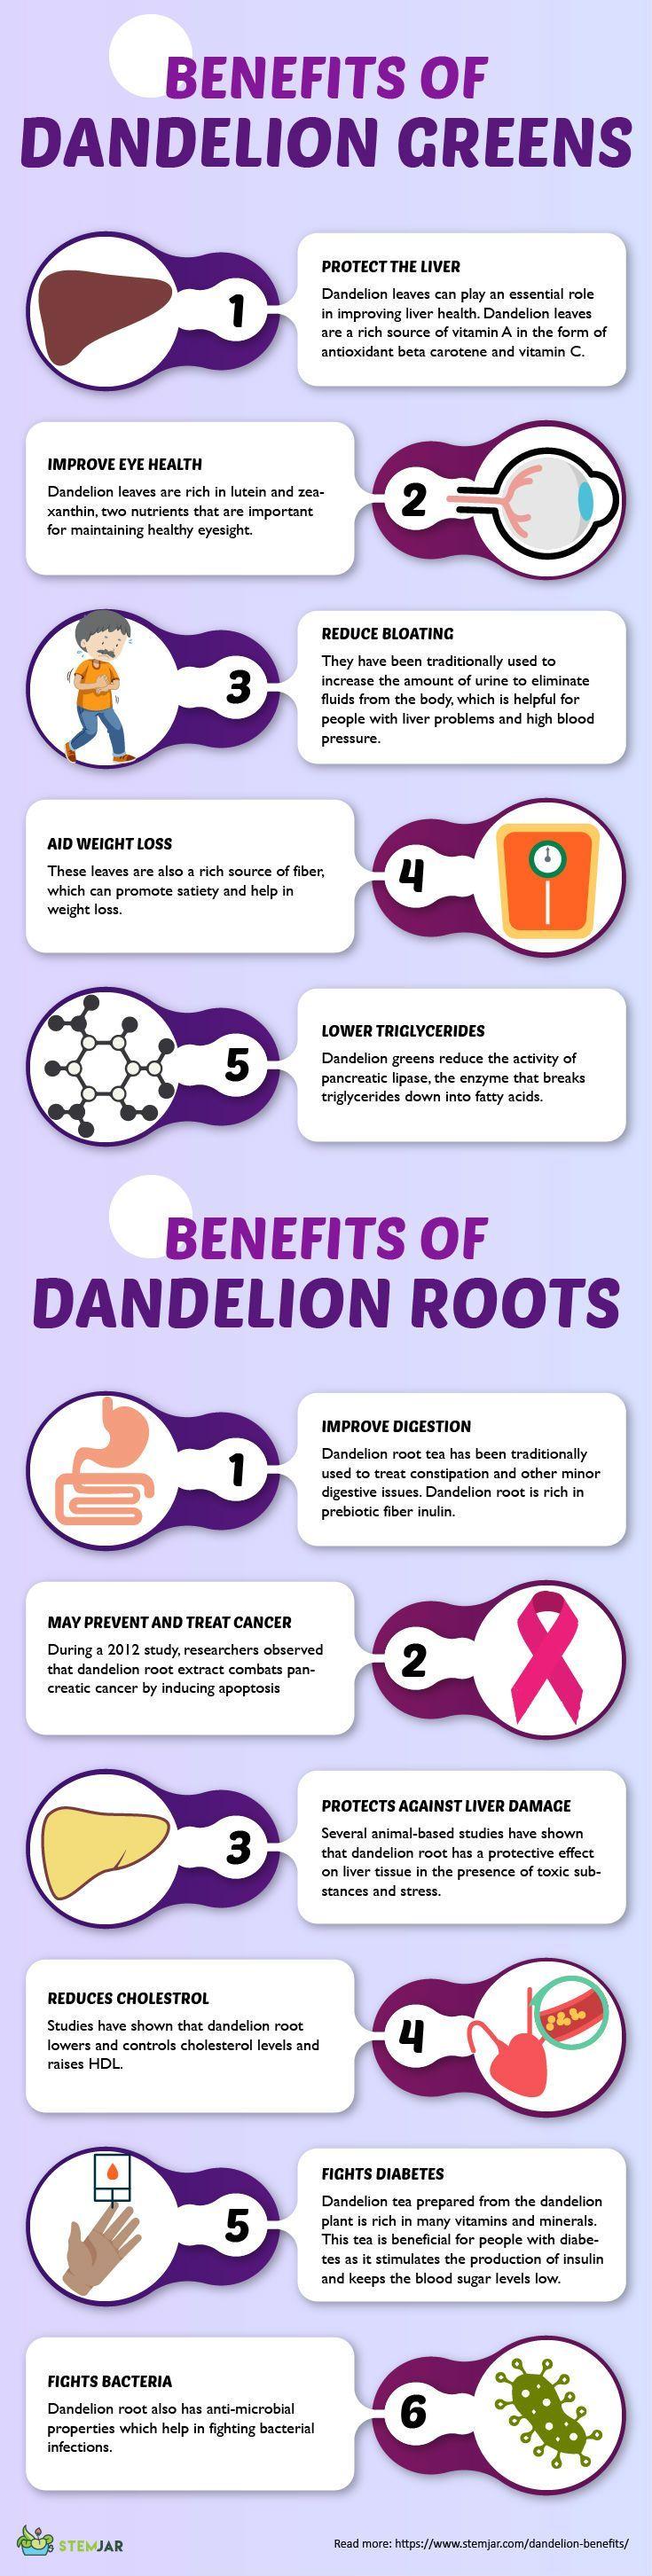 Dandelion - A Pesky Weed or Excellent Food and Medicine? #eggnutritionfacts